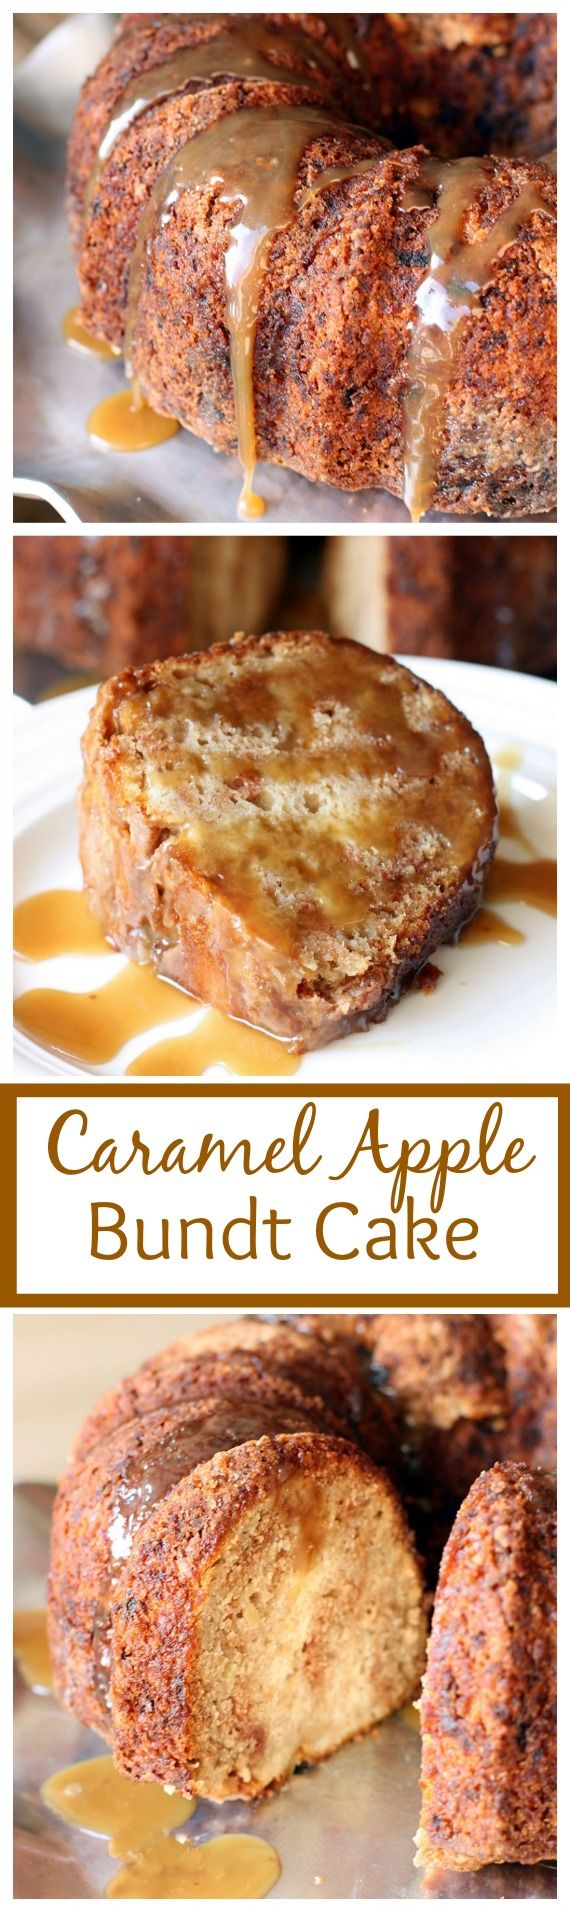 Caramel Apple Bundt Cake (My favorite Fall Cake!) Recipe on http://tastesbetterfromscratch.com